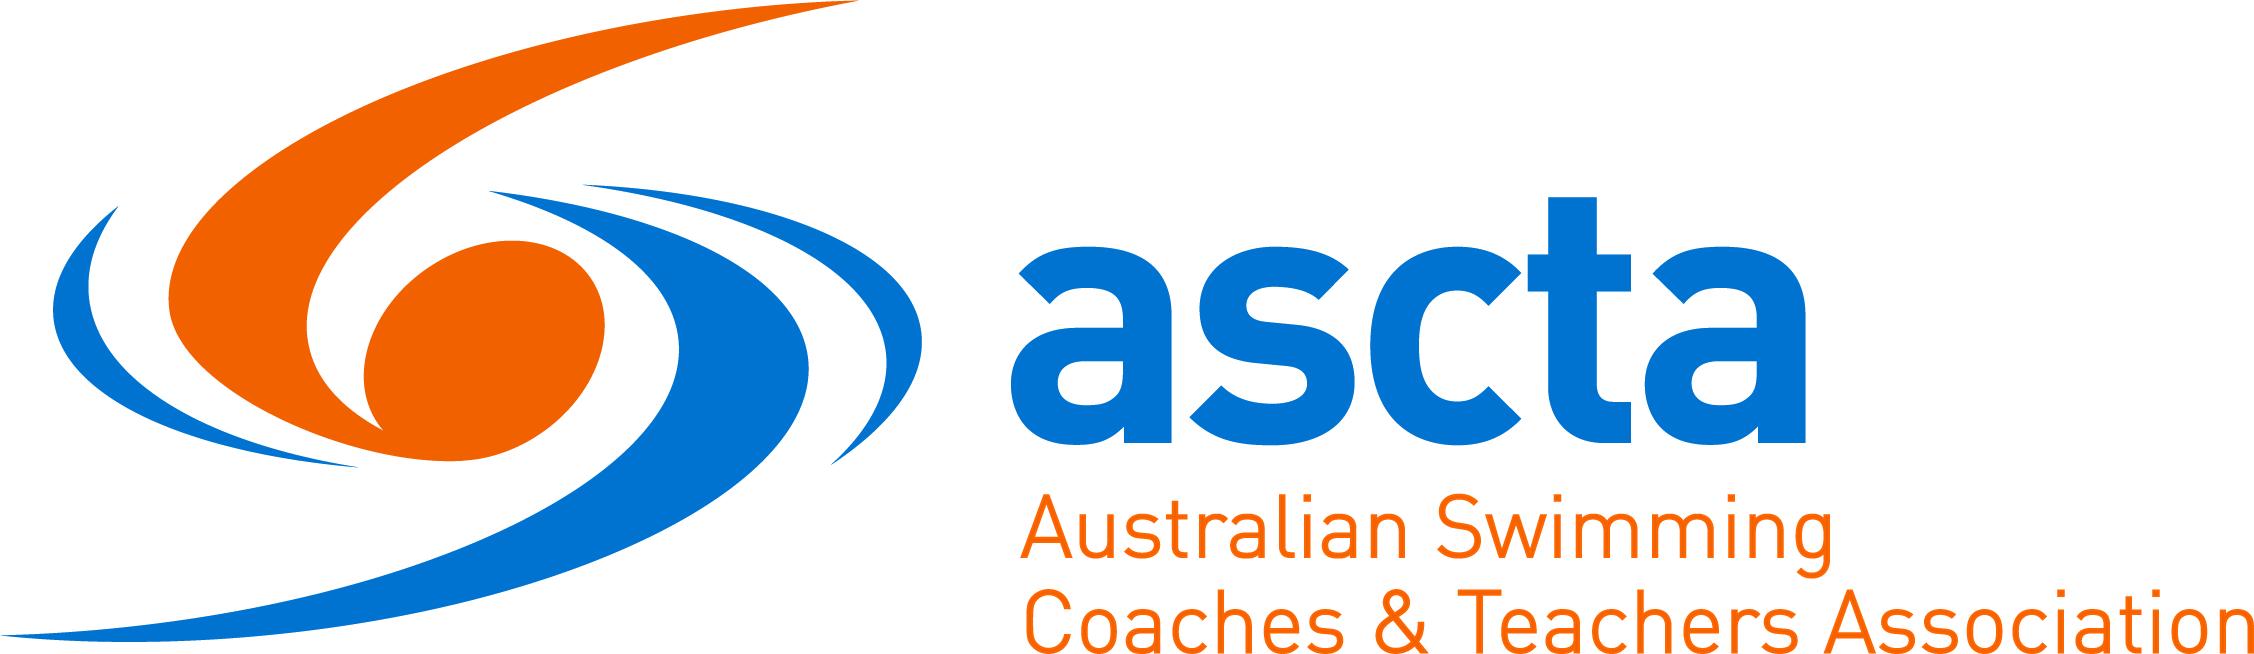 Australian Swimming Coaches & Teachers Association